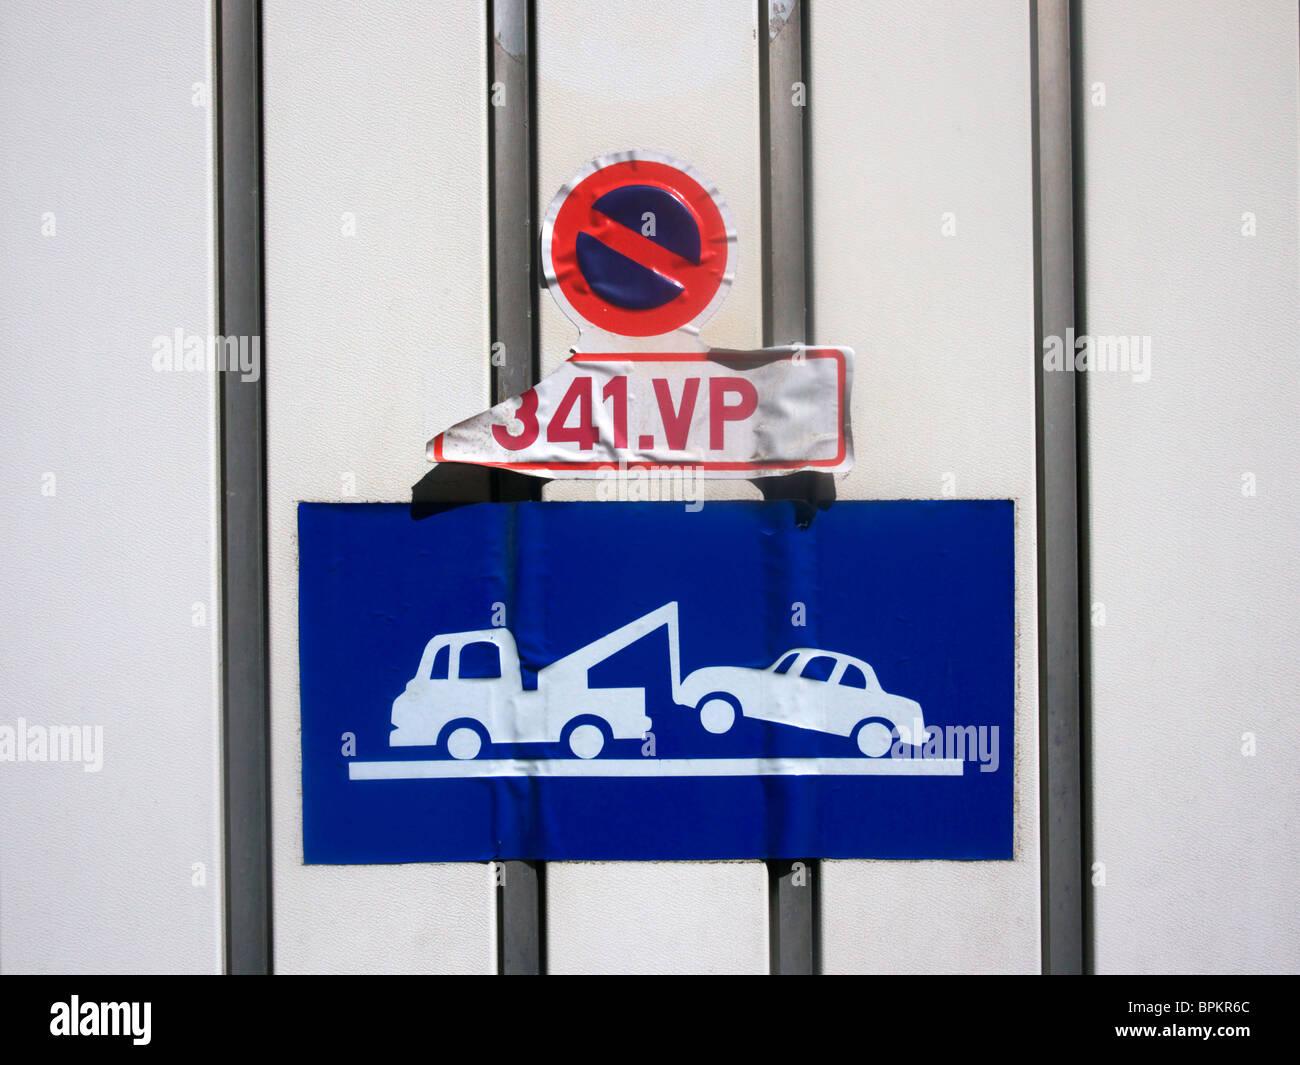 No parking sign at a garage - Stock Image